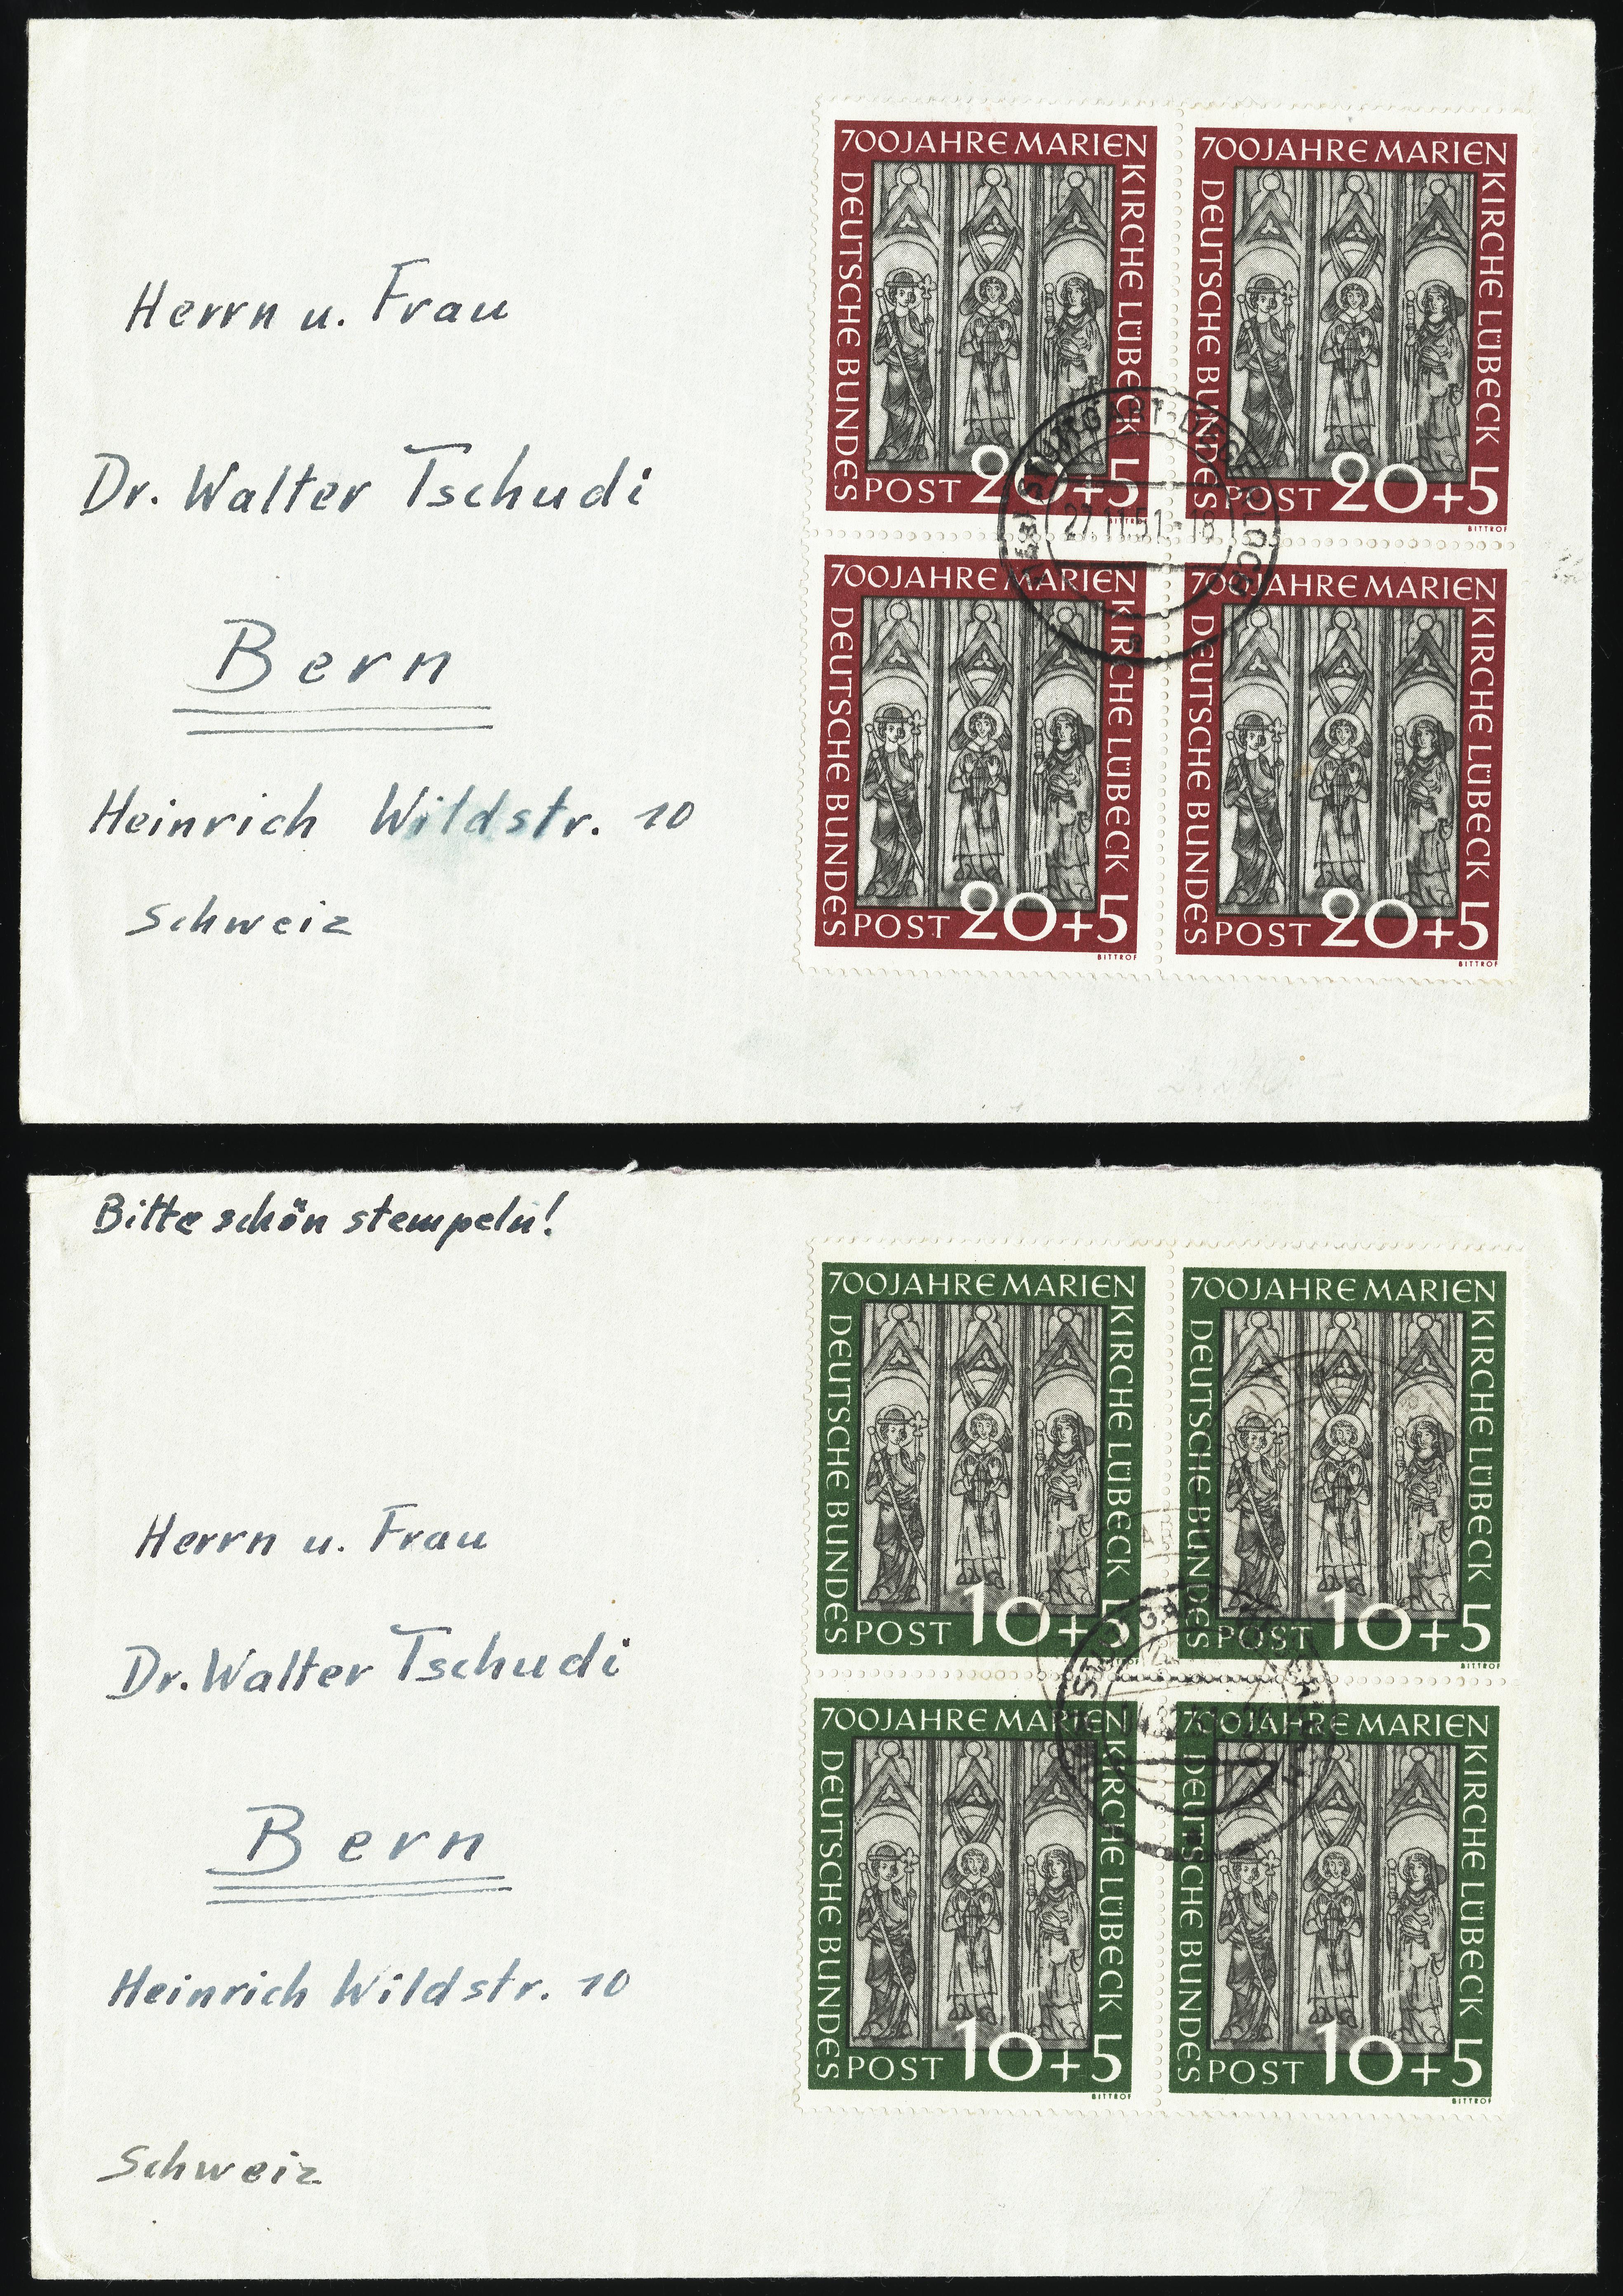 Lot 2847 - germany after 1945 federal republic of germany -  Heinrich Koehler Auktionen Heinrich Köhler Auction 376 - Day 1